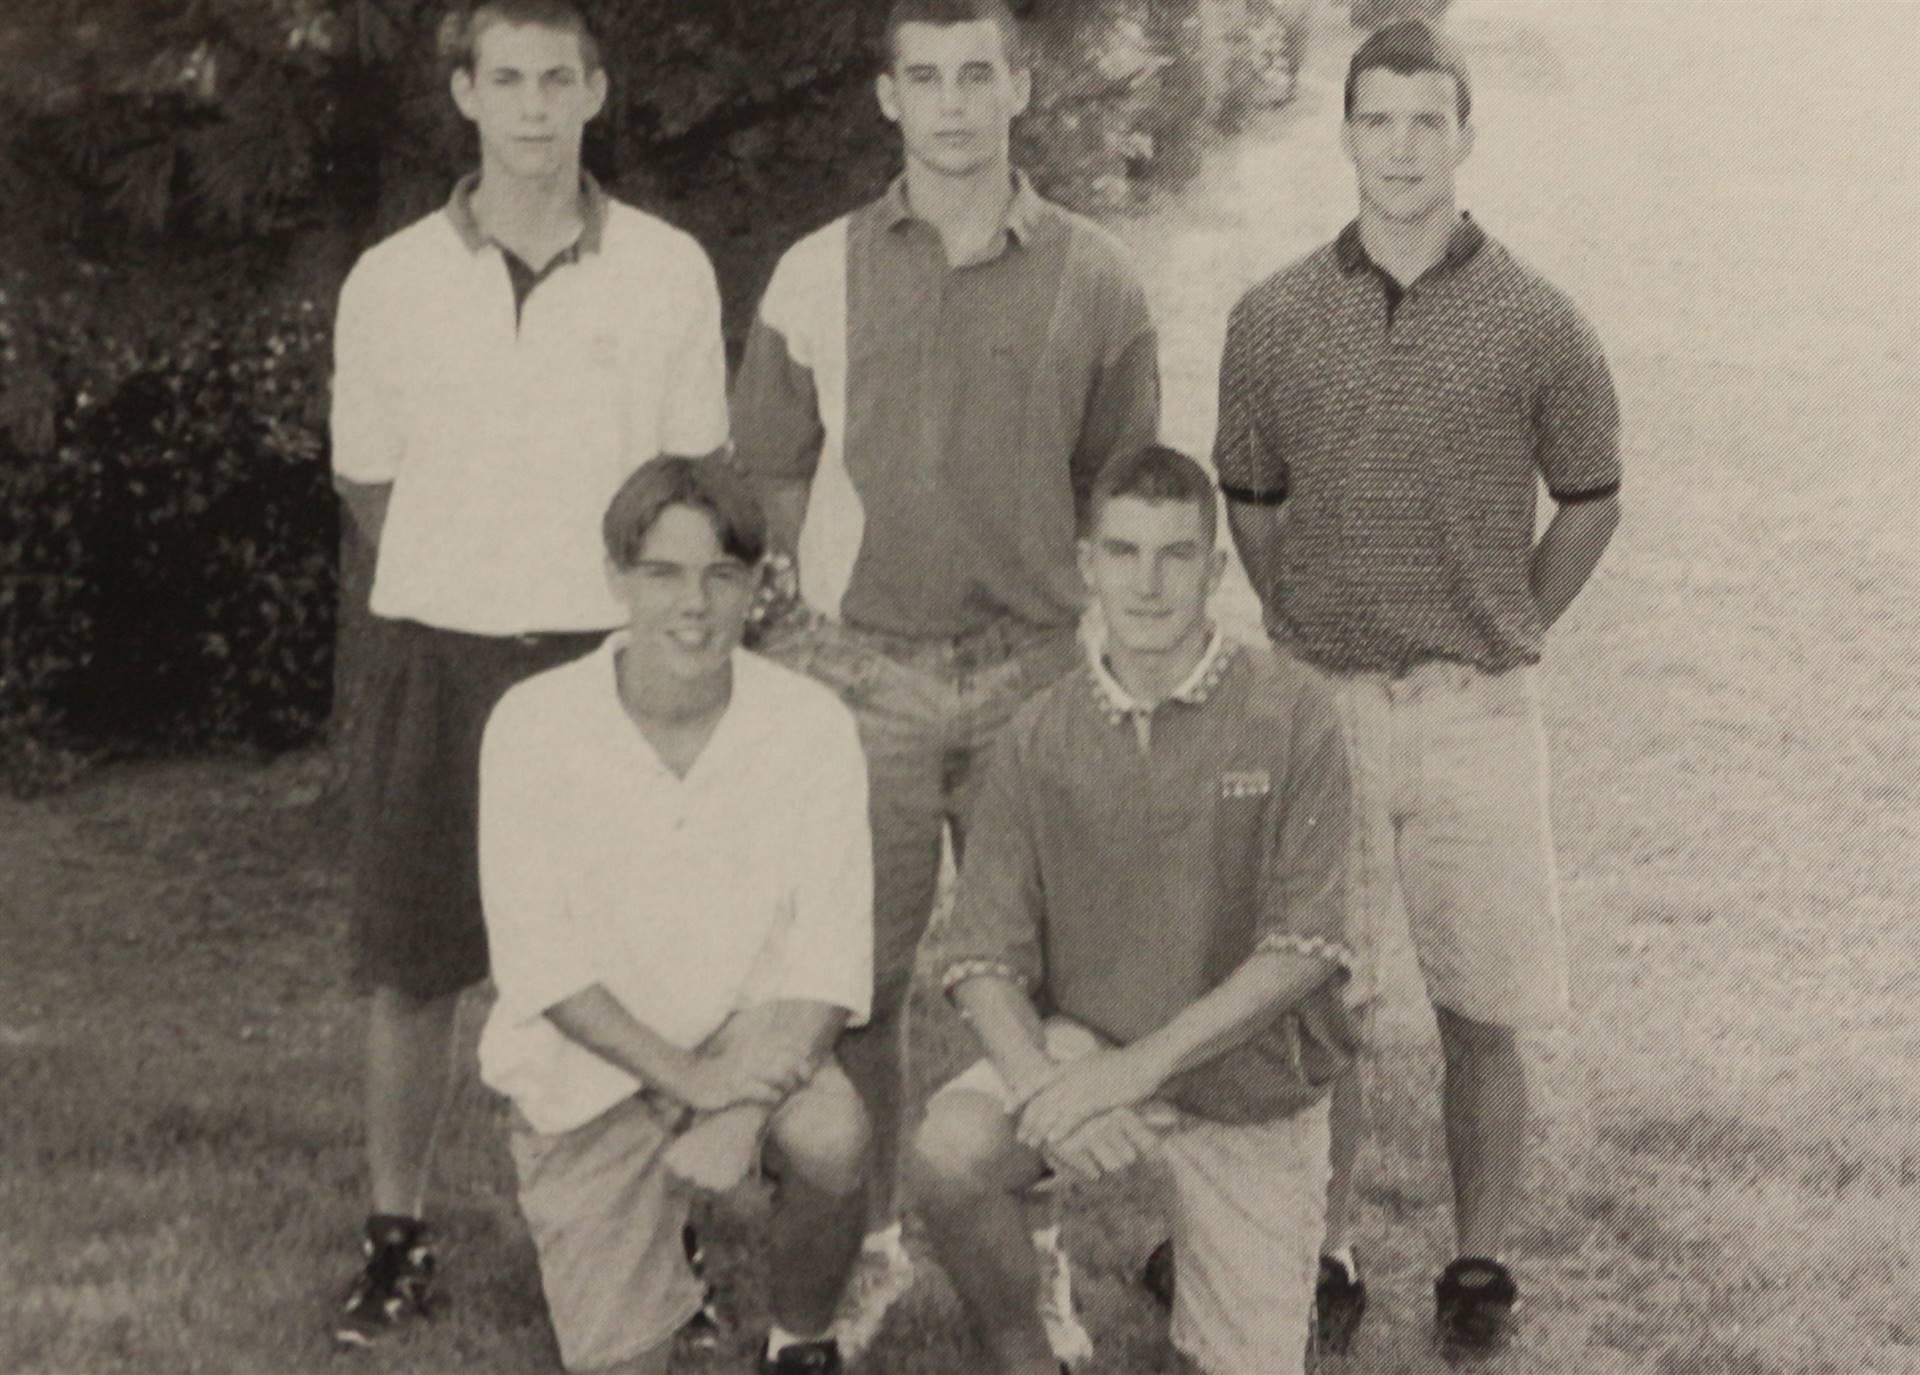 1996 Golf